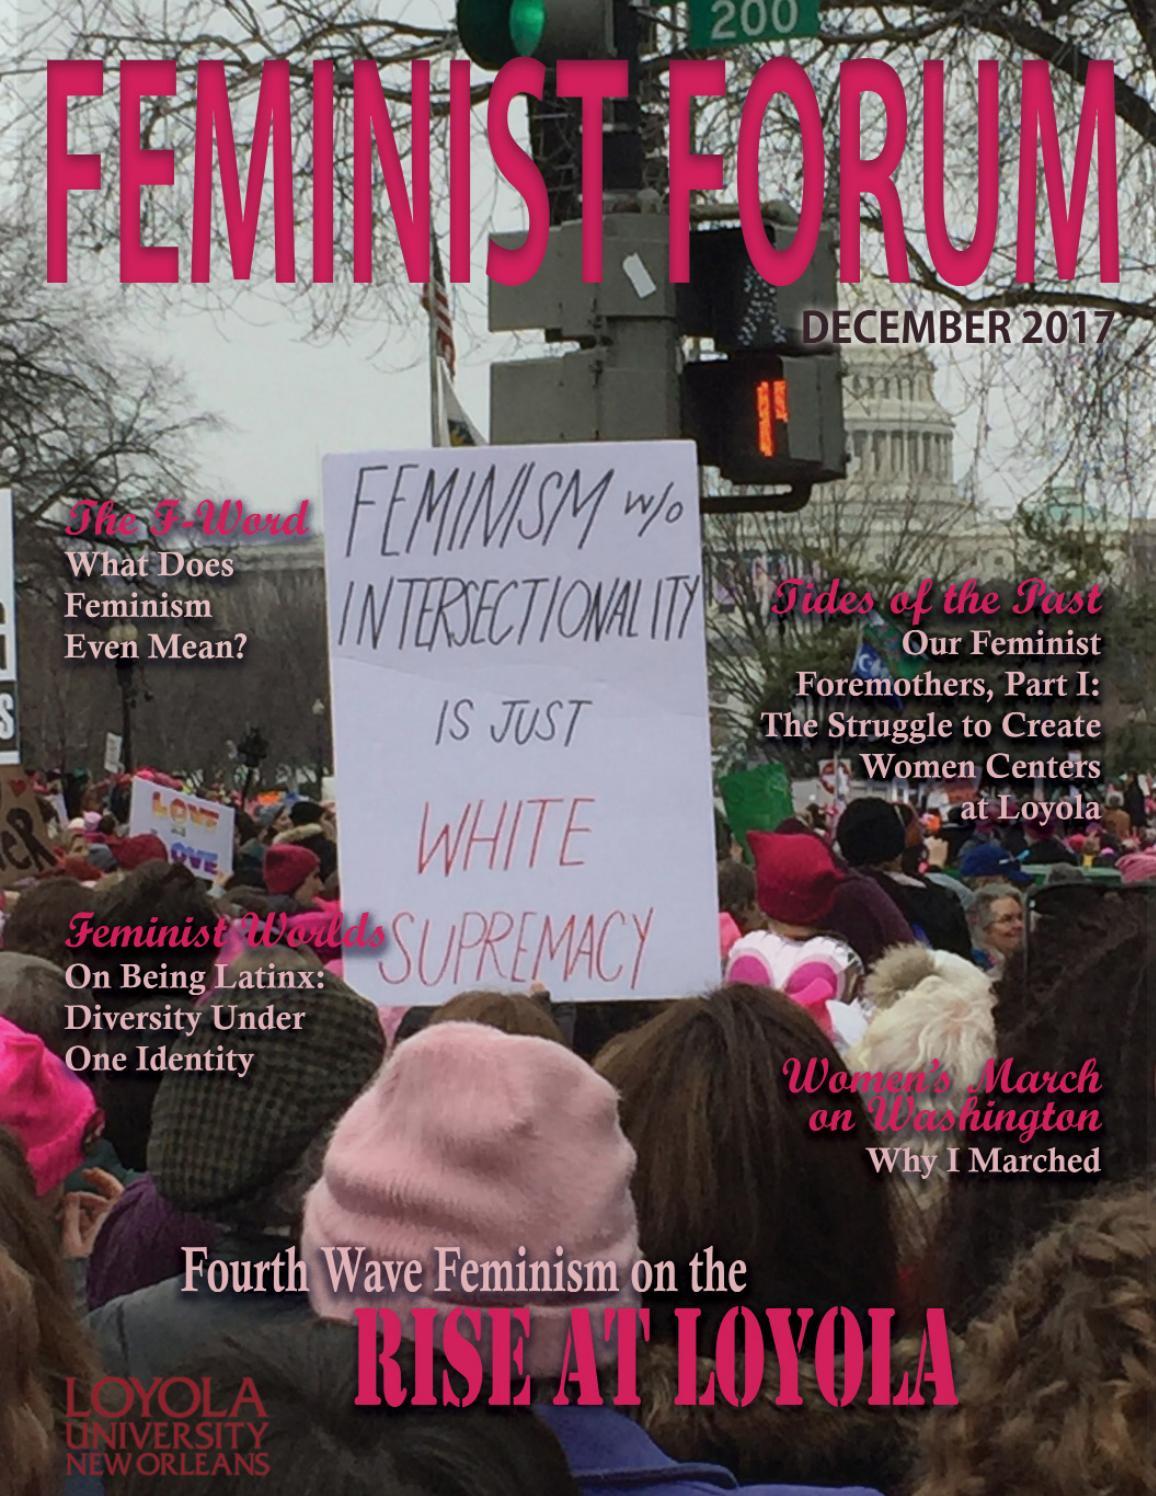 dc3c3c90d94c5 Feminist Forum Magazine Winter 2017  Women s Resource Center by Loyola  University New Orleans - issuu